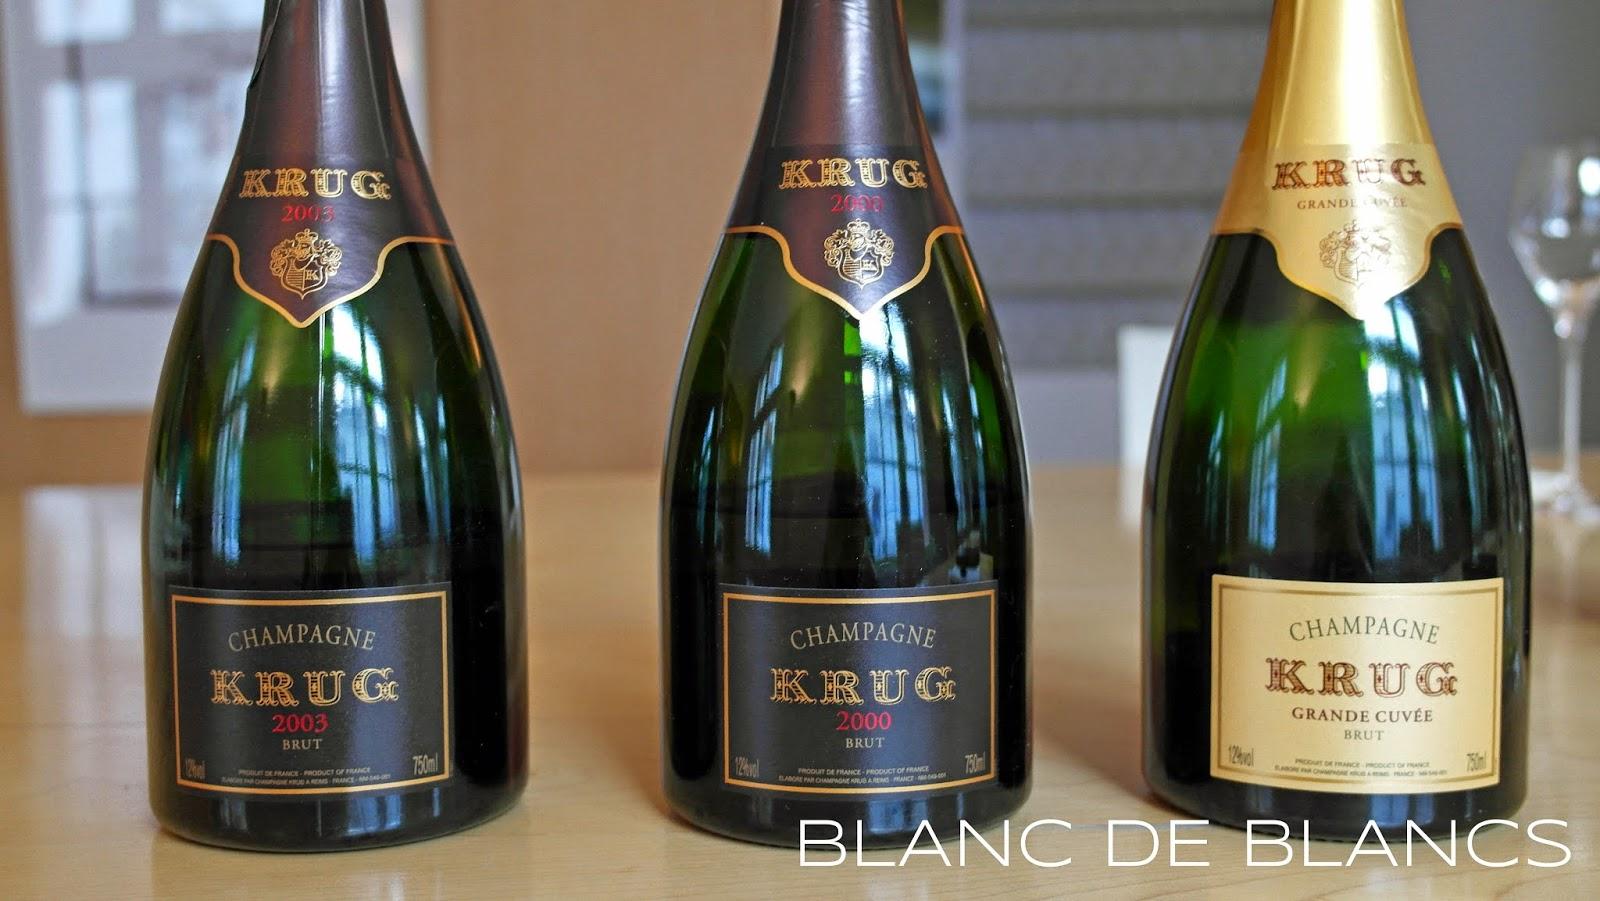 Krug tasting - www.blancdeblancs.fi